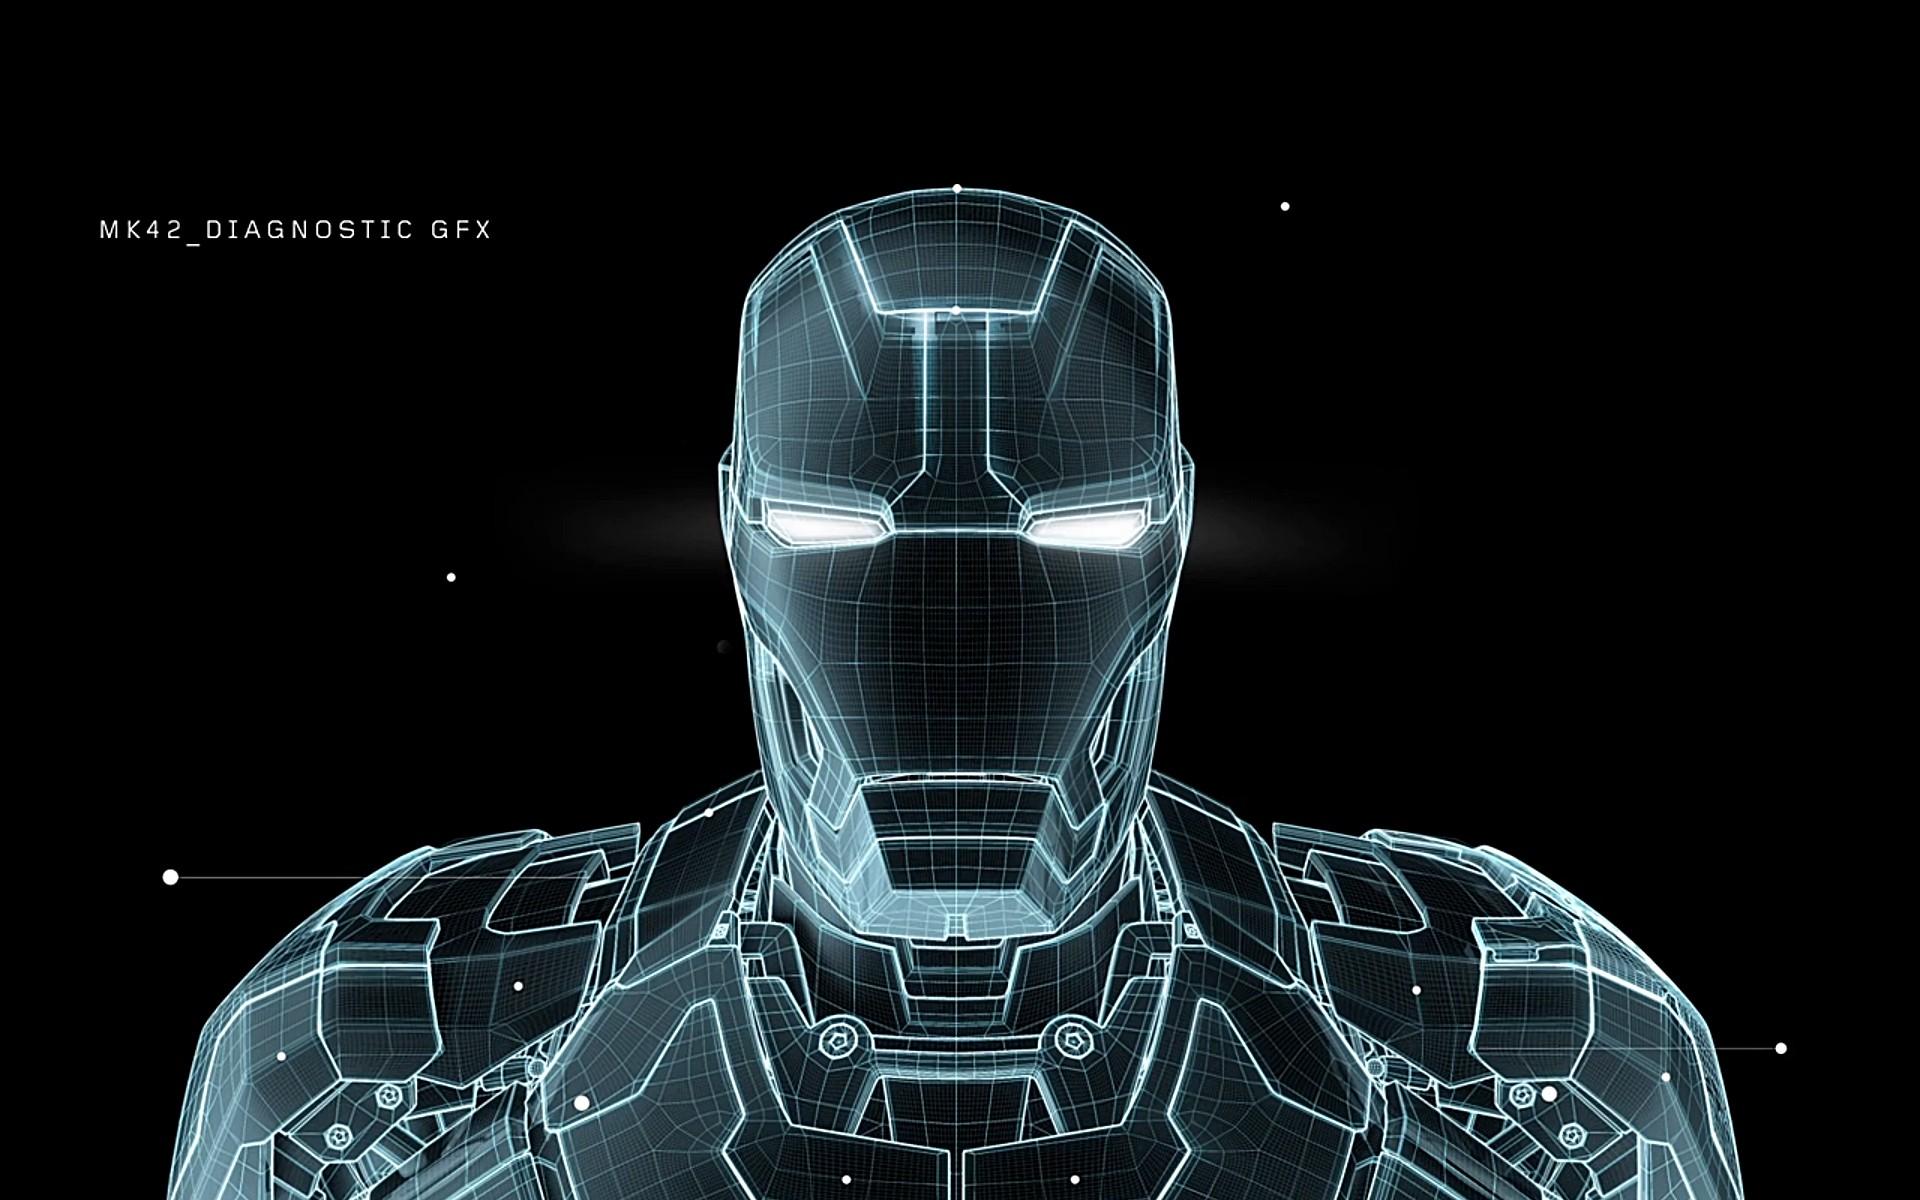 Iron Man Animated Gif Movie Iron Man 3 Wallpaper Iron Man 1920x1200 Download Hd Wallpaper Wallpapertip